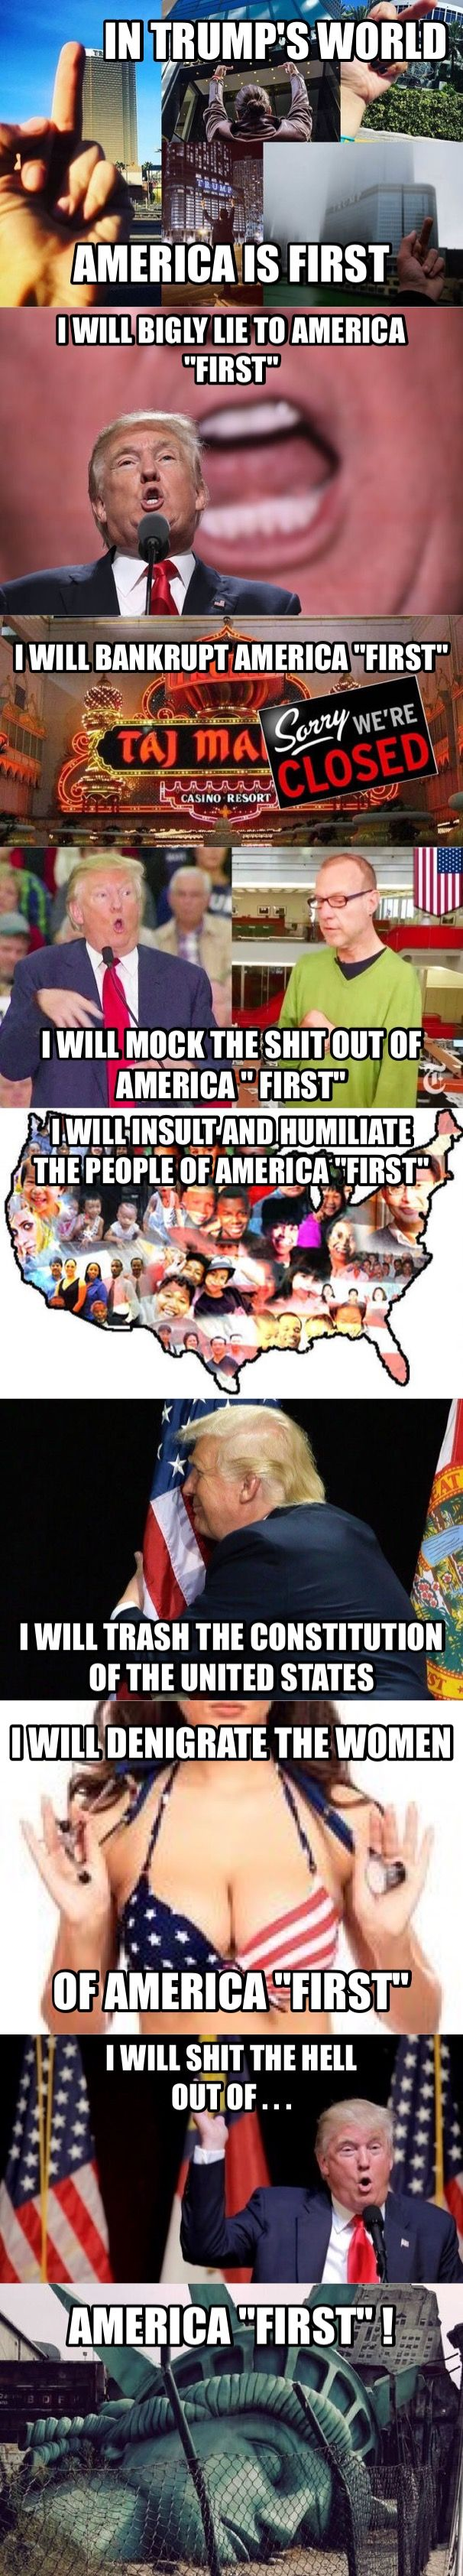 So Sickening!  #TrumpStoleit HE IS A ILLEGITIMATE PERSON AND A ILLEGITIMATE PRESIDENT!!! Pass it on!